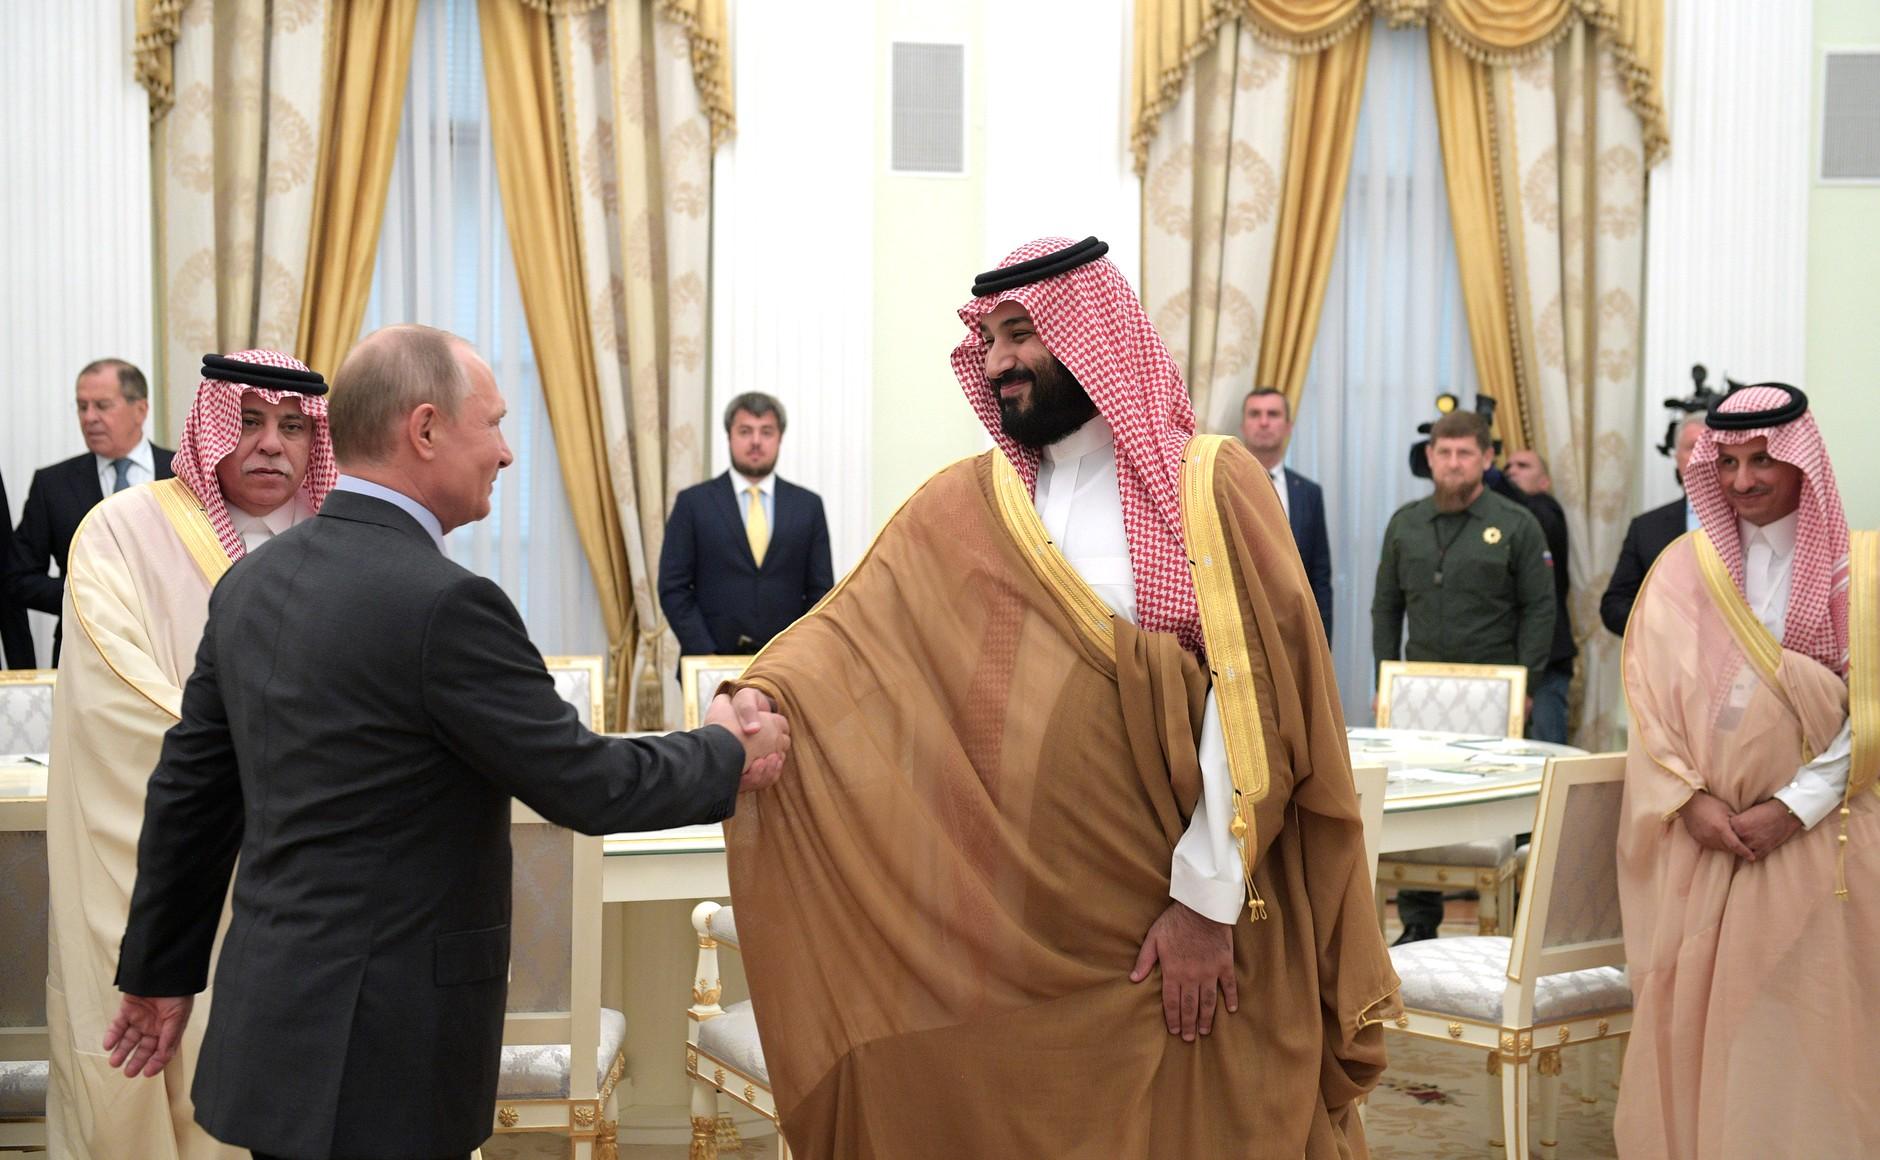 Vladimir_Putin_and_Mohammad_bin_Salman_(2018-06-14)_01